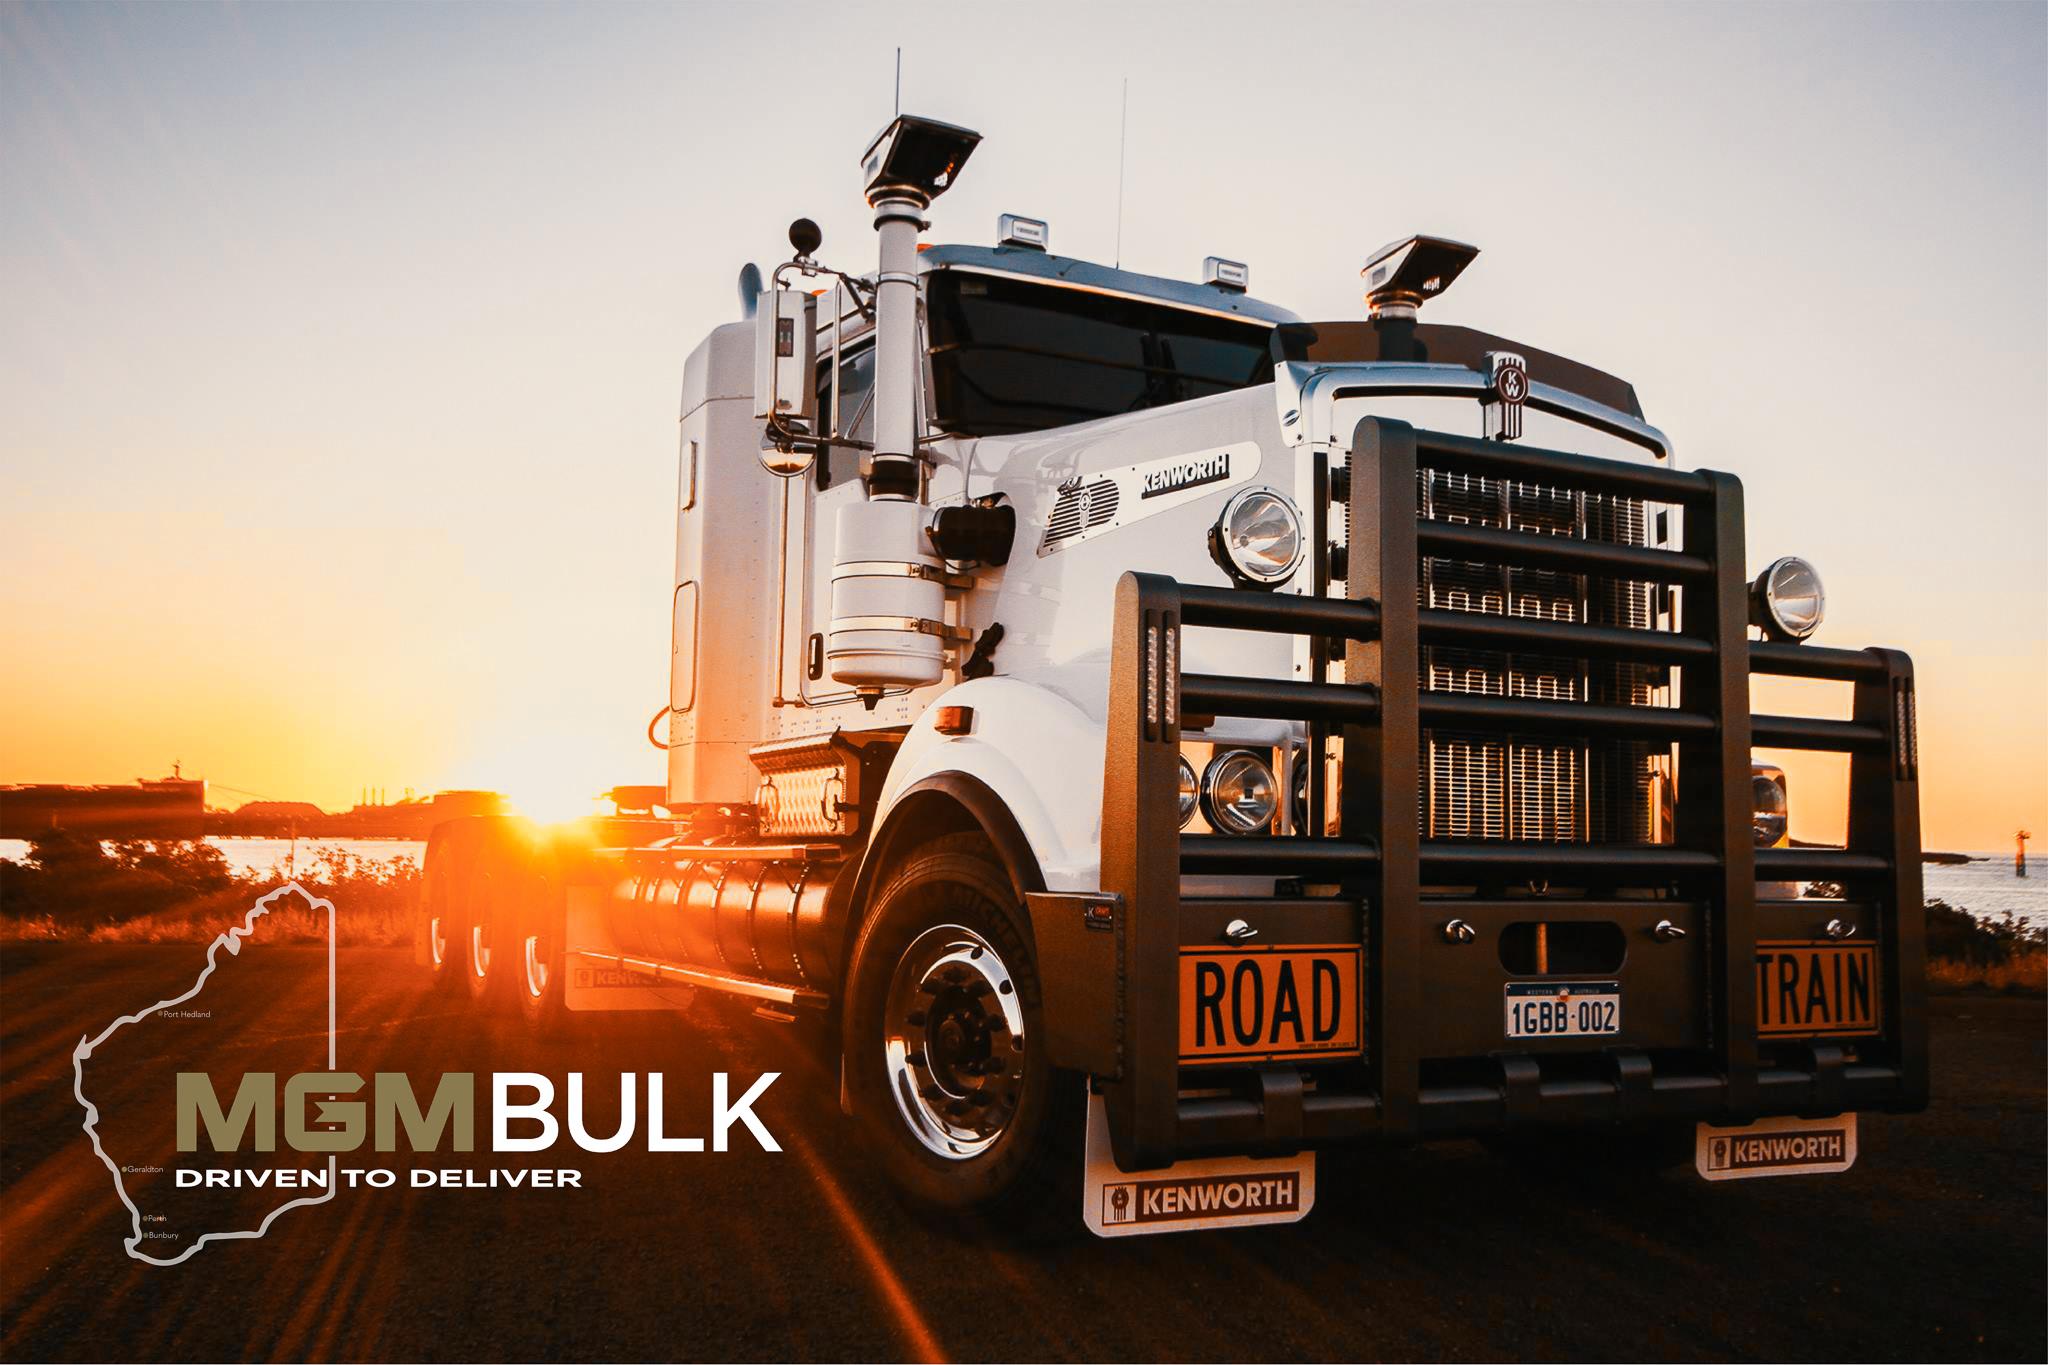 MC Driver - Quad Road Train Operator Jobs Available | MGM Bulk